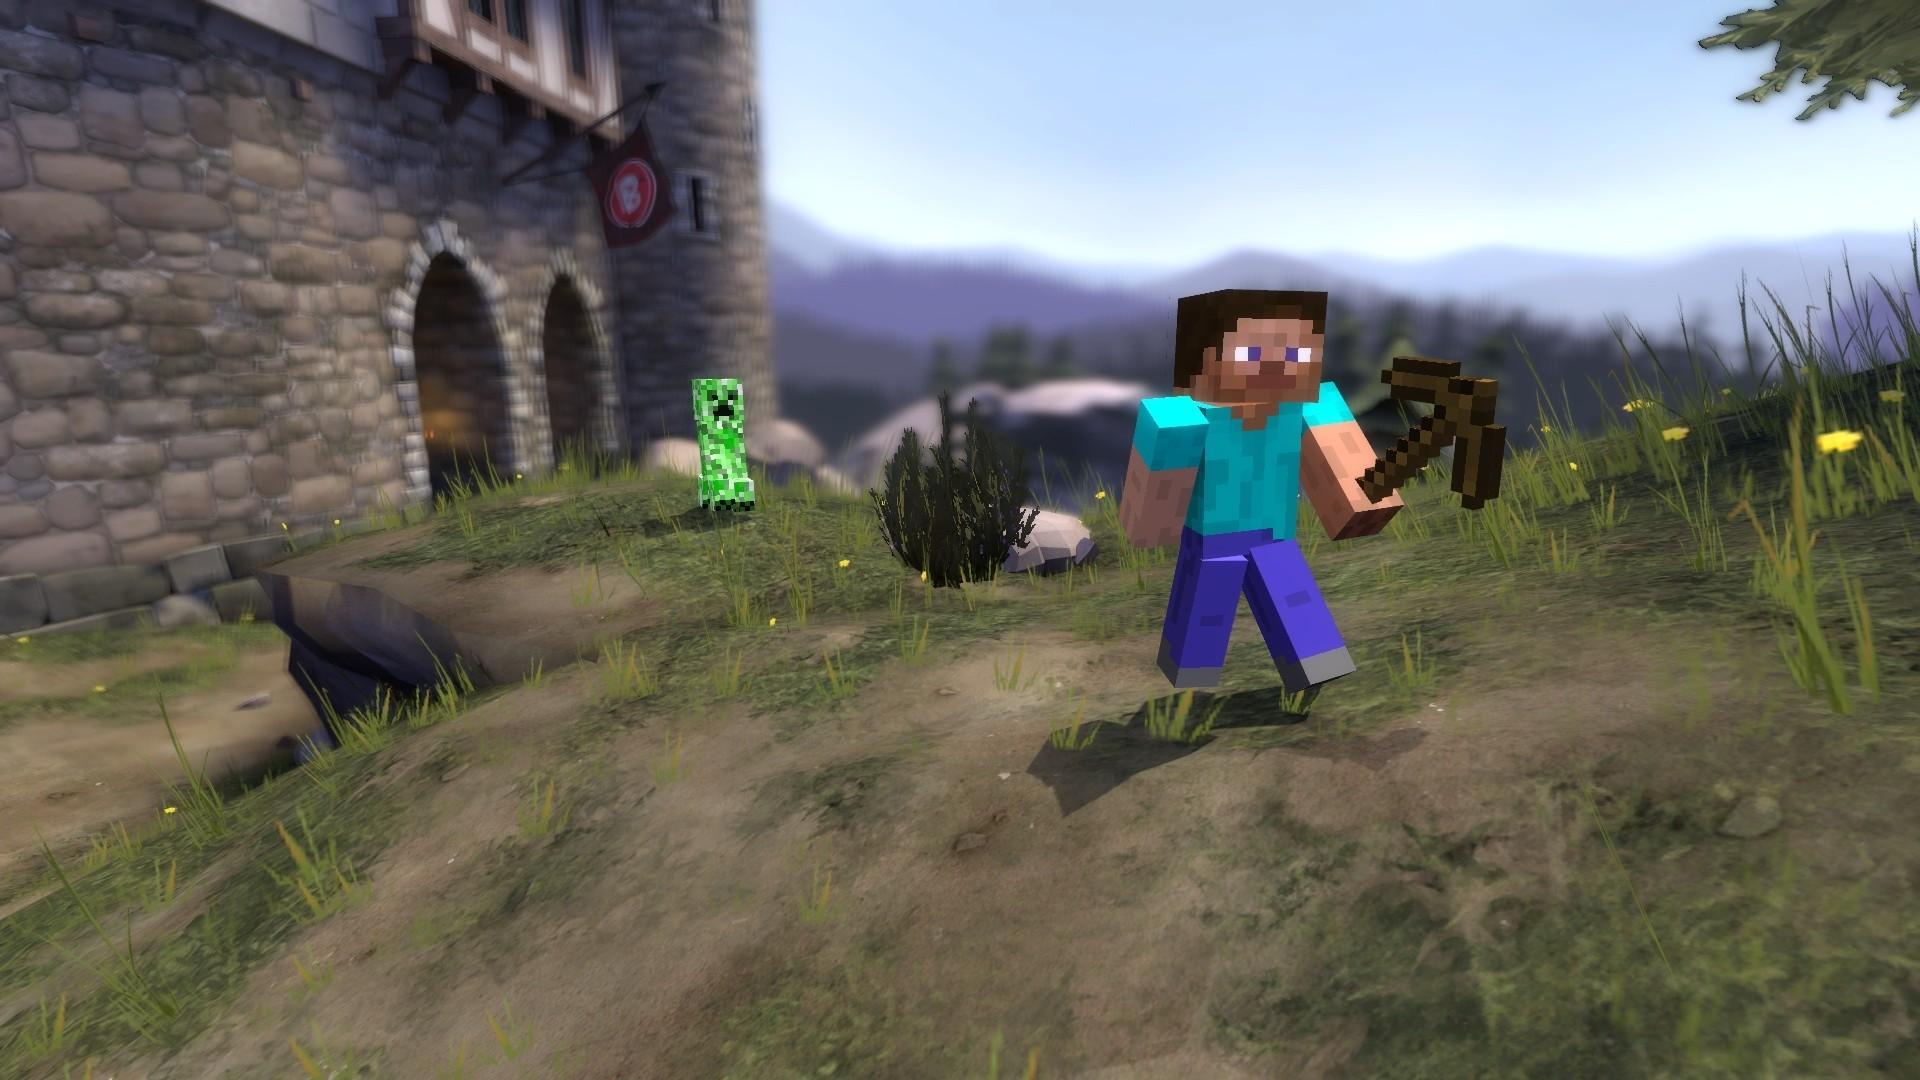 Video Games Gmod Minecraft Team Fortress 2 Wallpaper